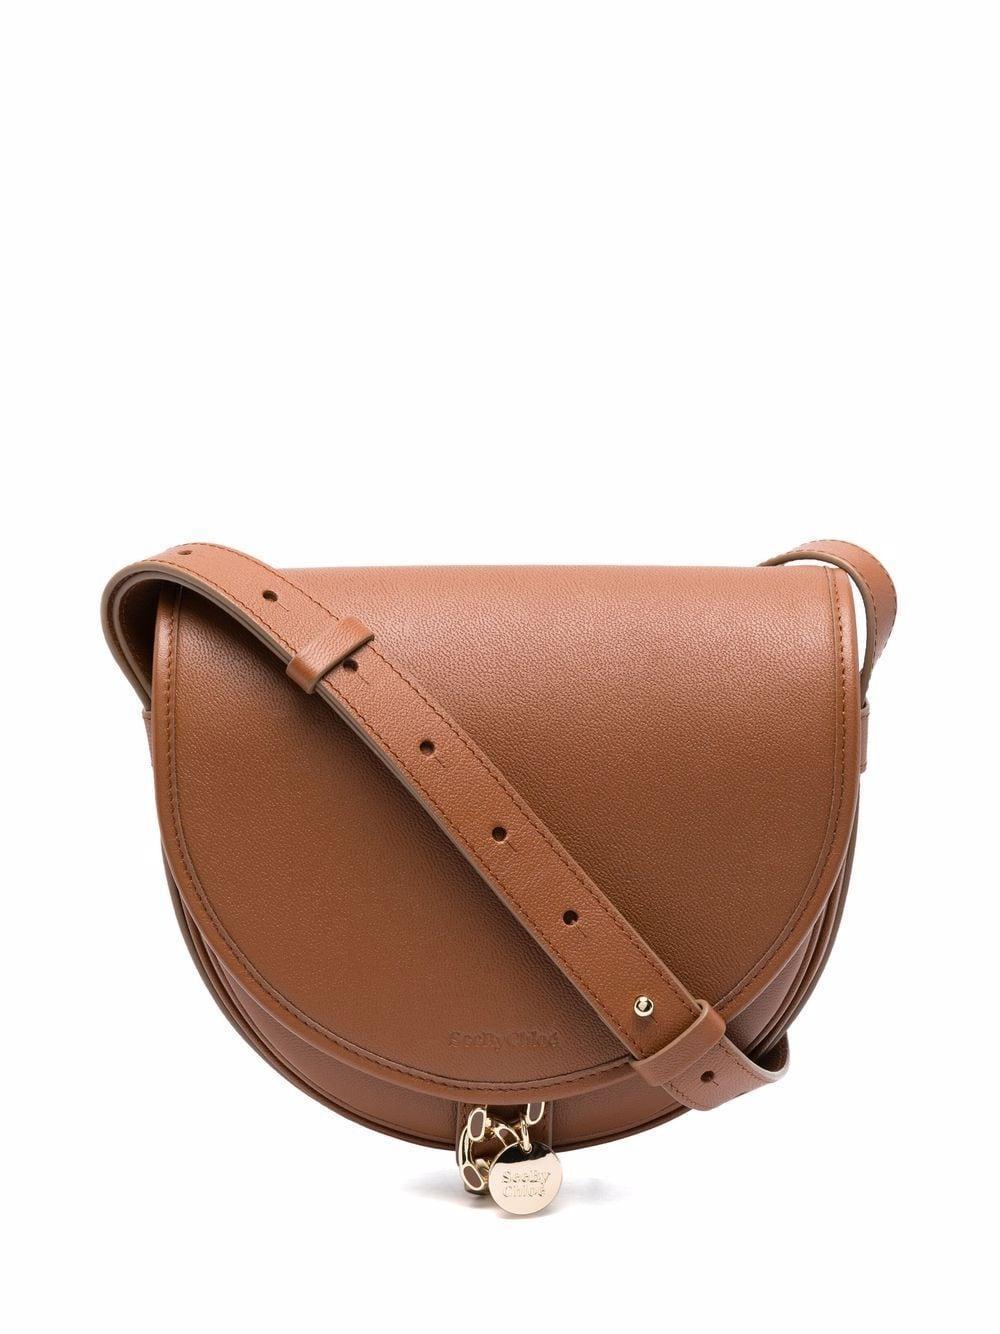 Leather Satchel Item # CHS21ASB11388